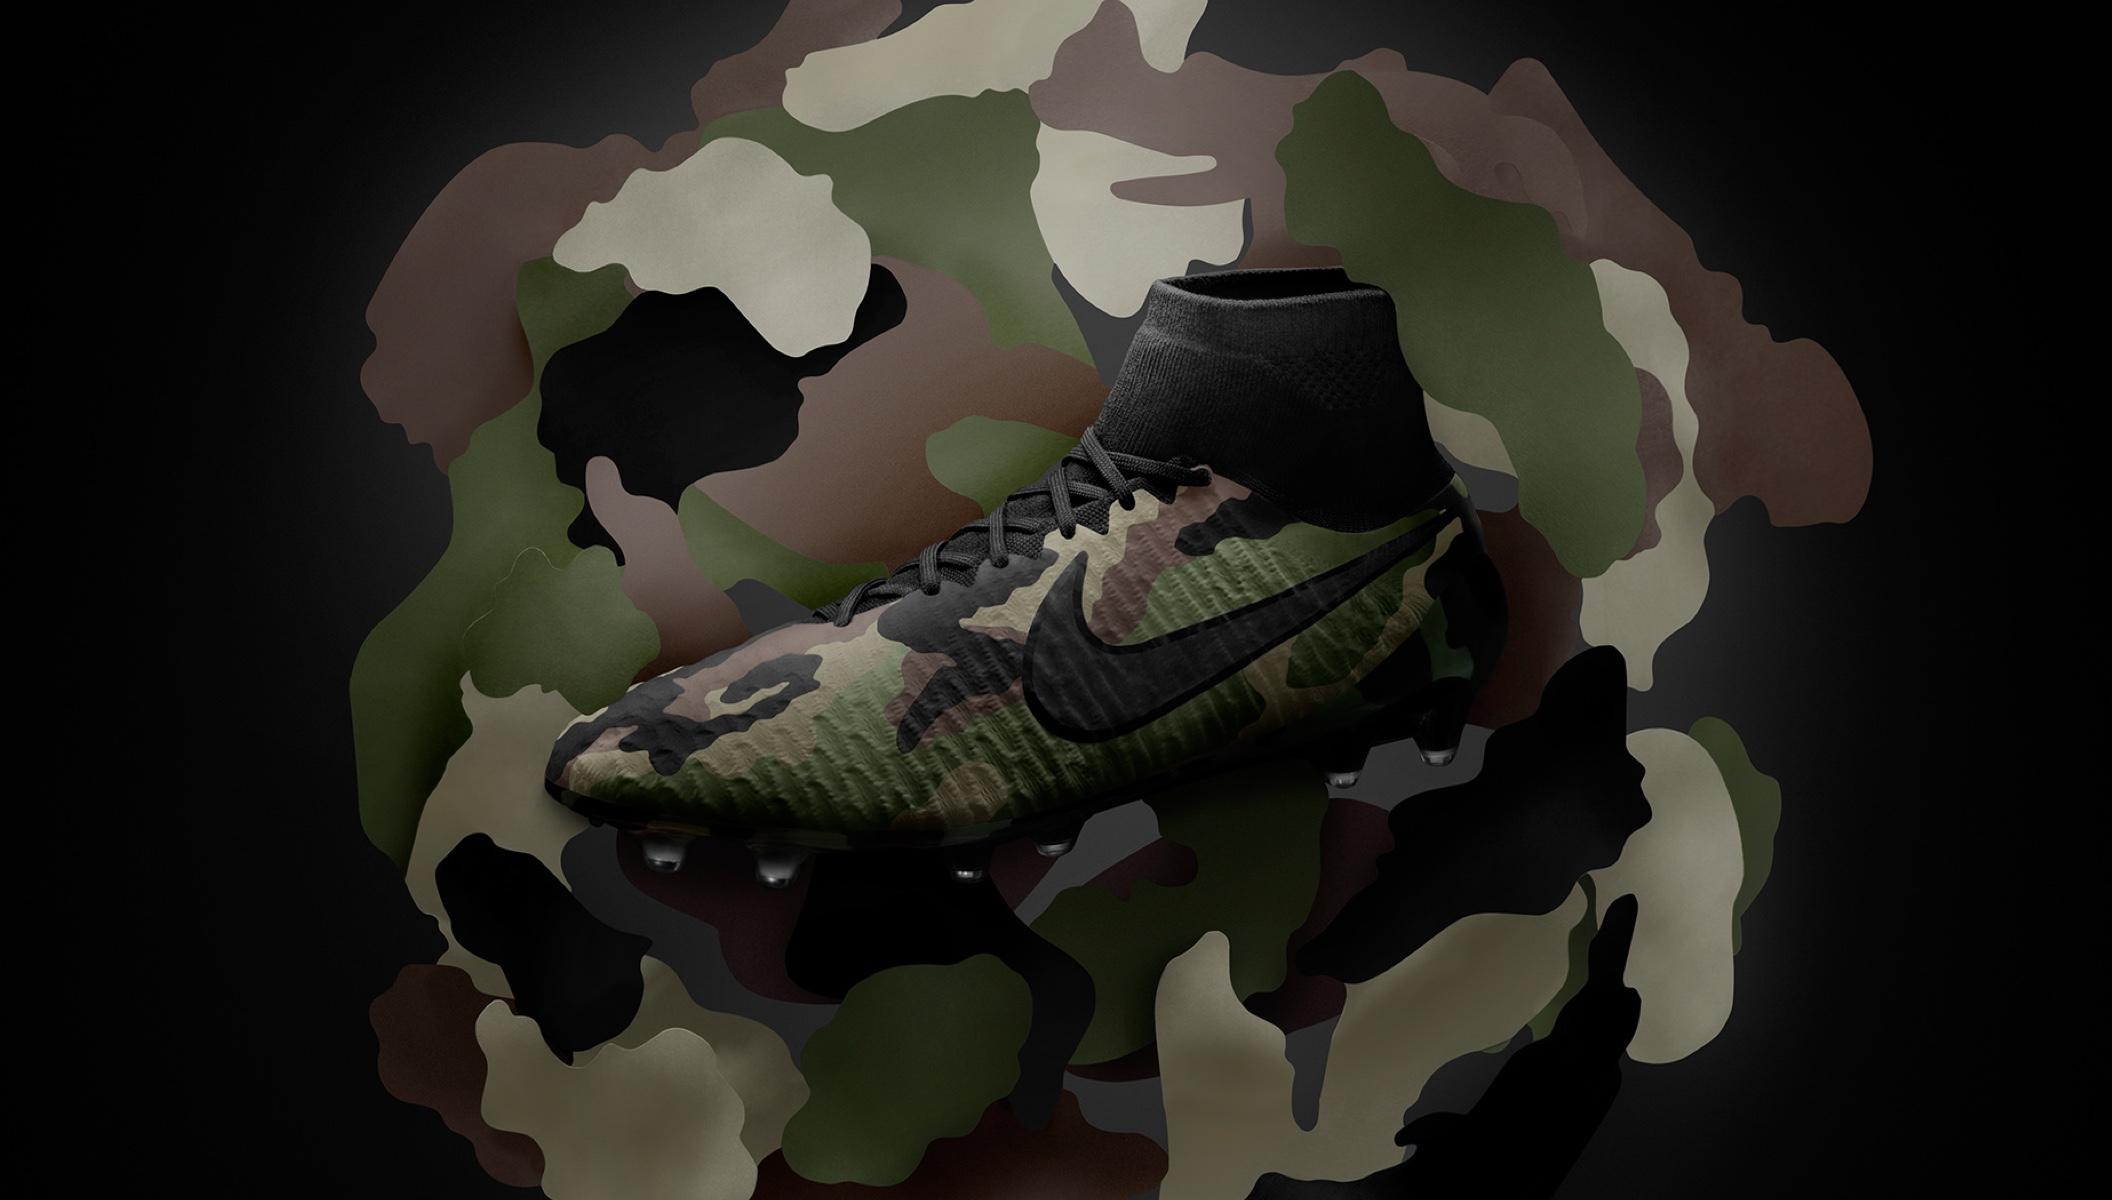 NikeFootball4